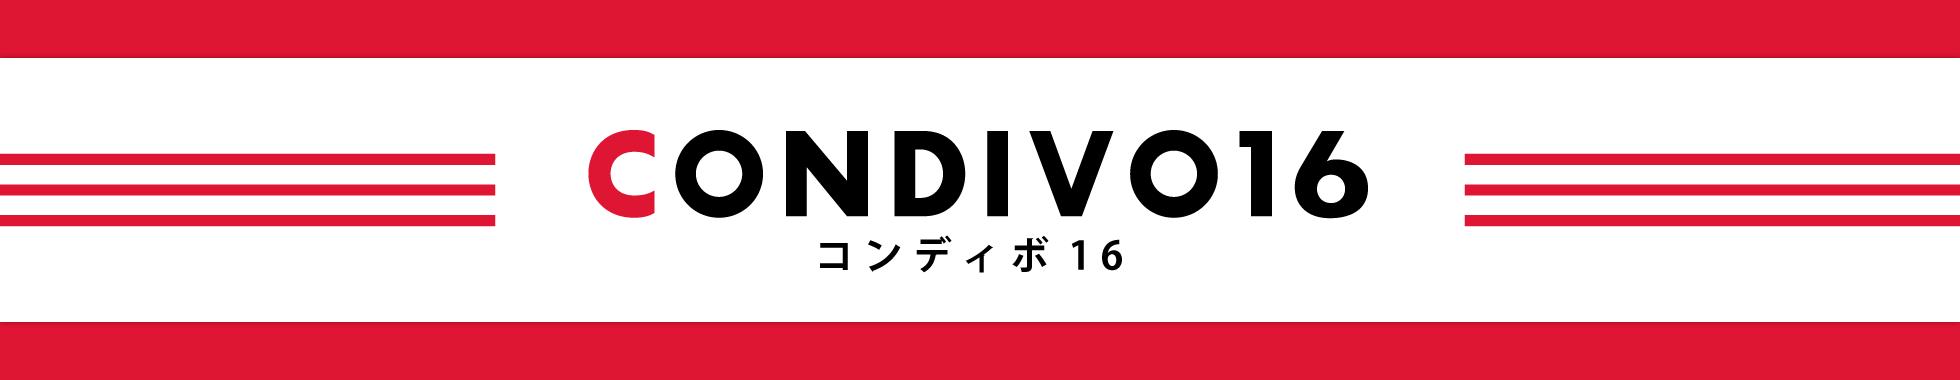 miadidas マイアディダス CONDIVO16